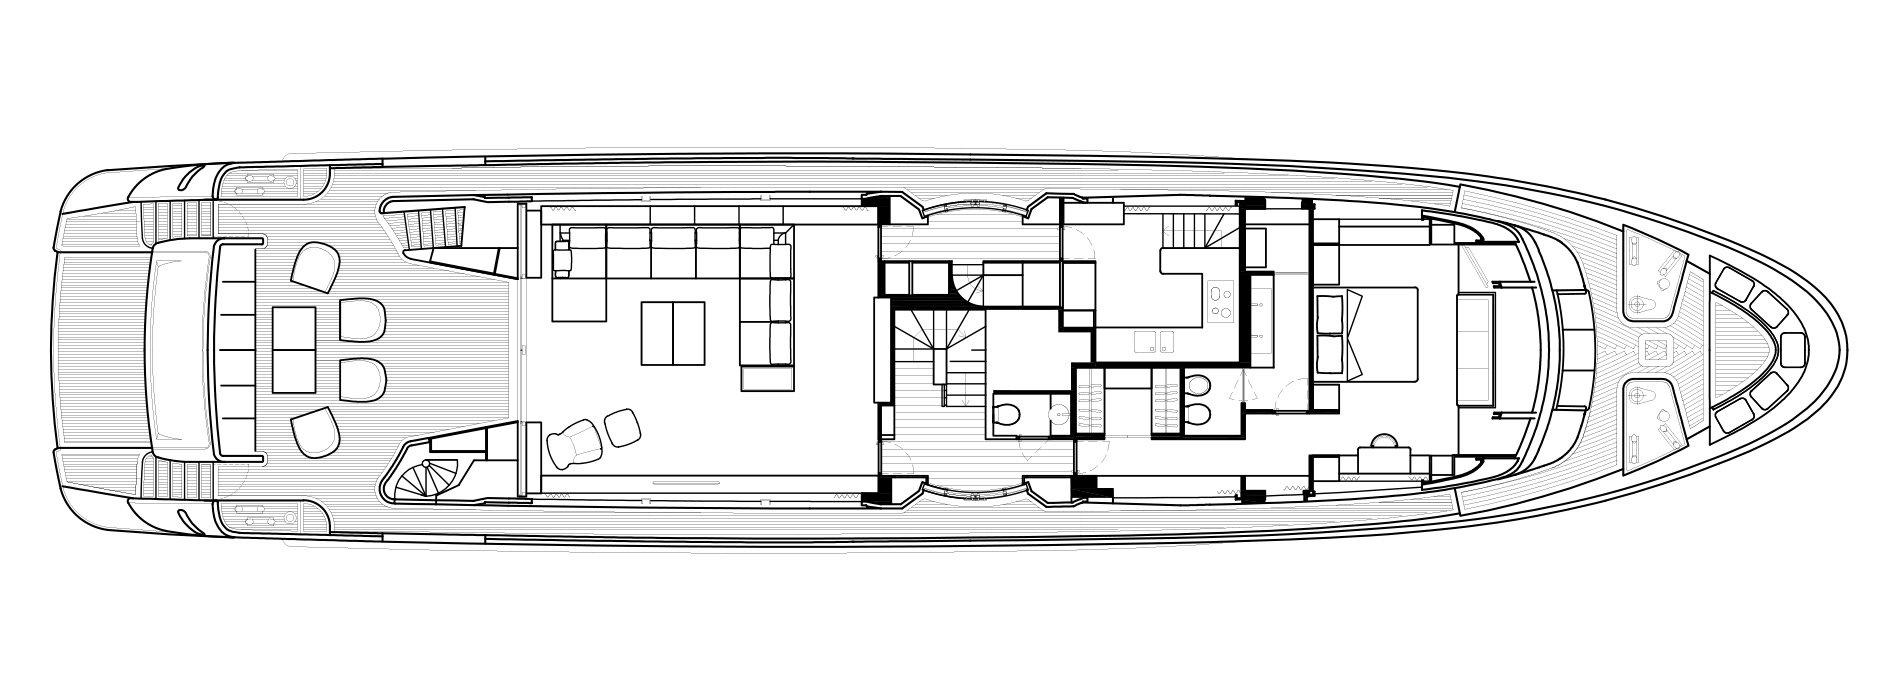 Sanlorenzo Yachts SD112 Pont principal Versione B